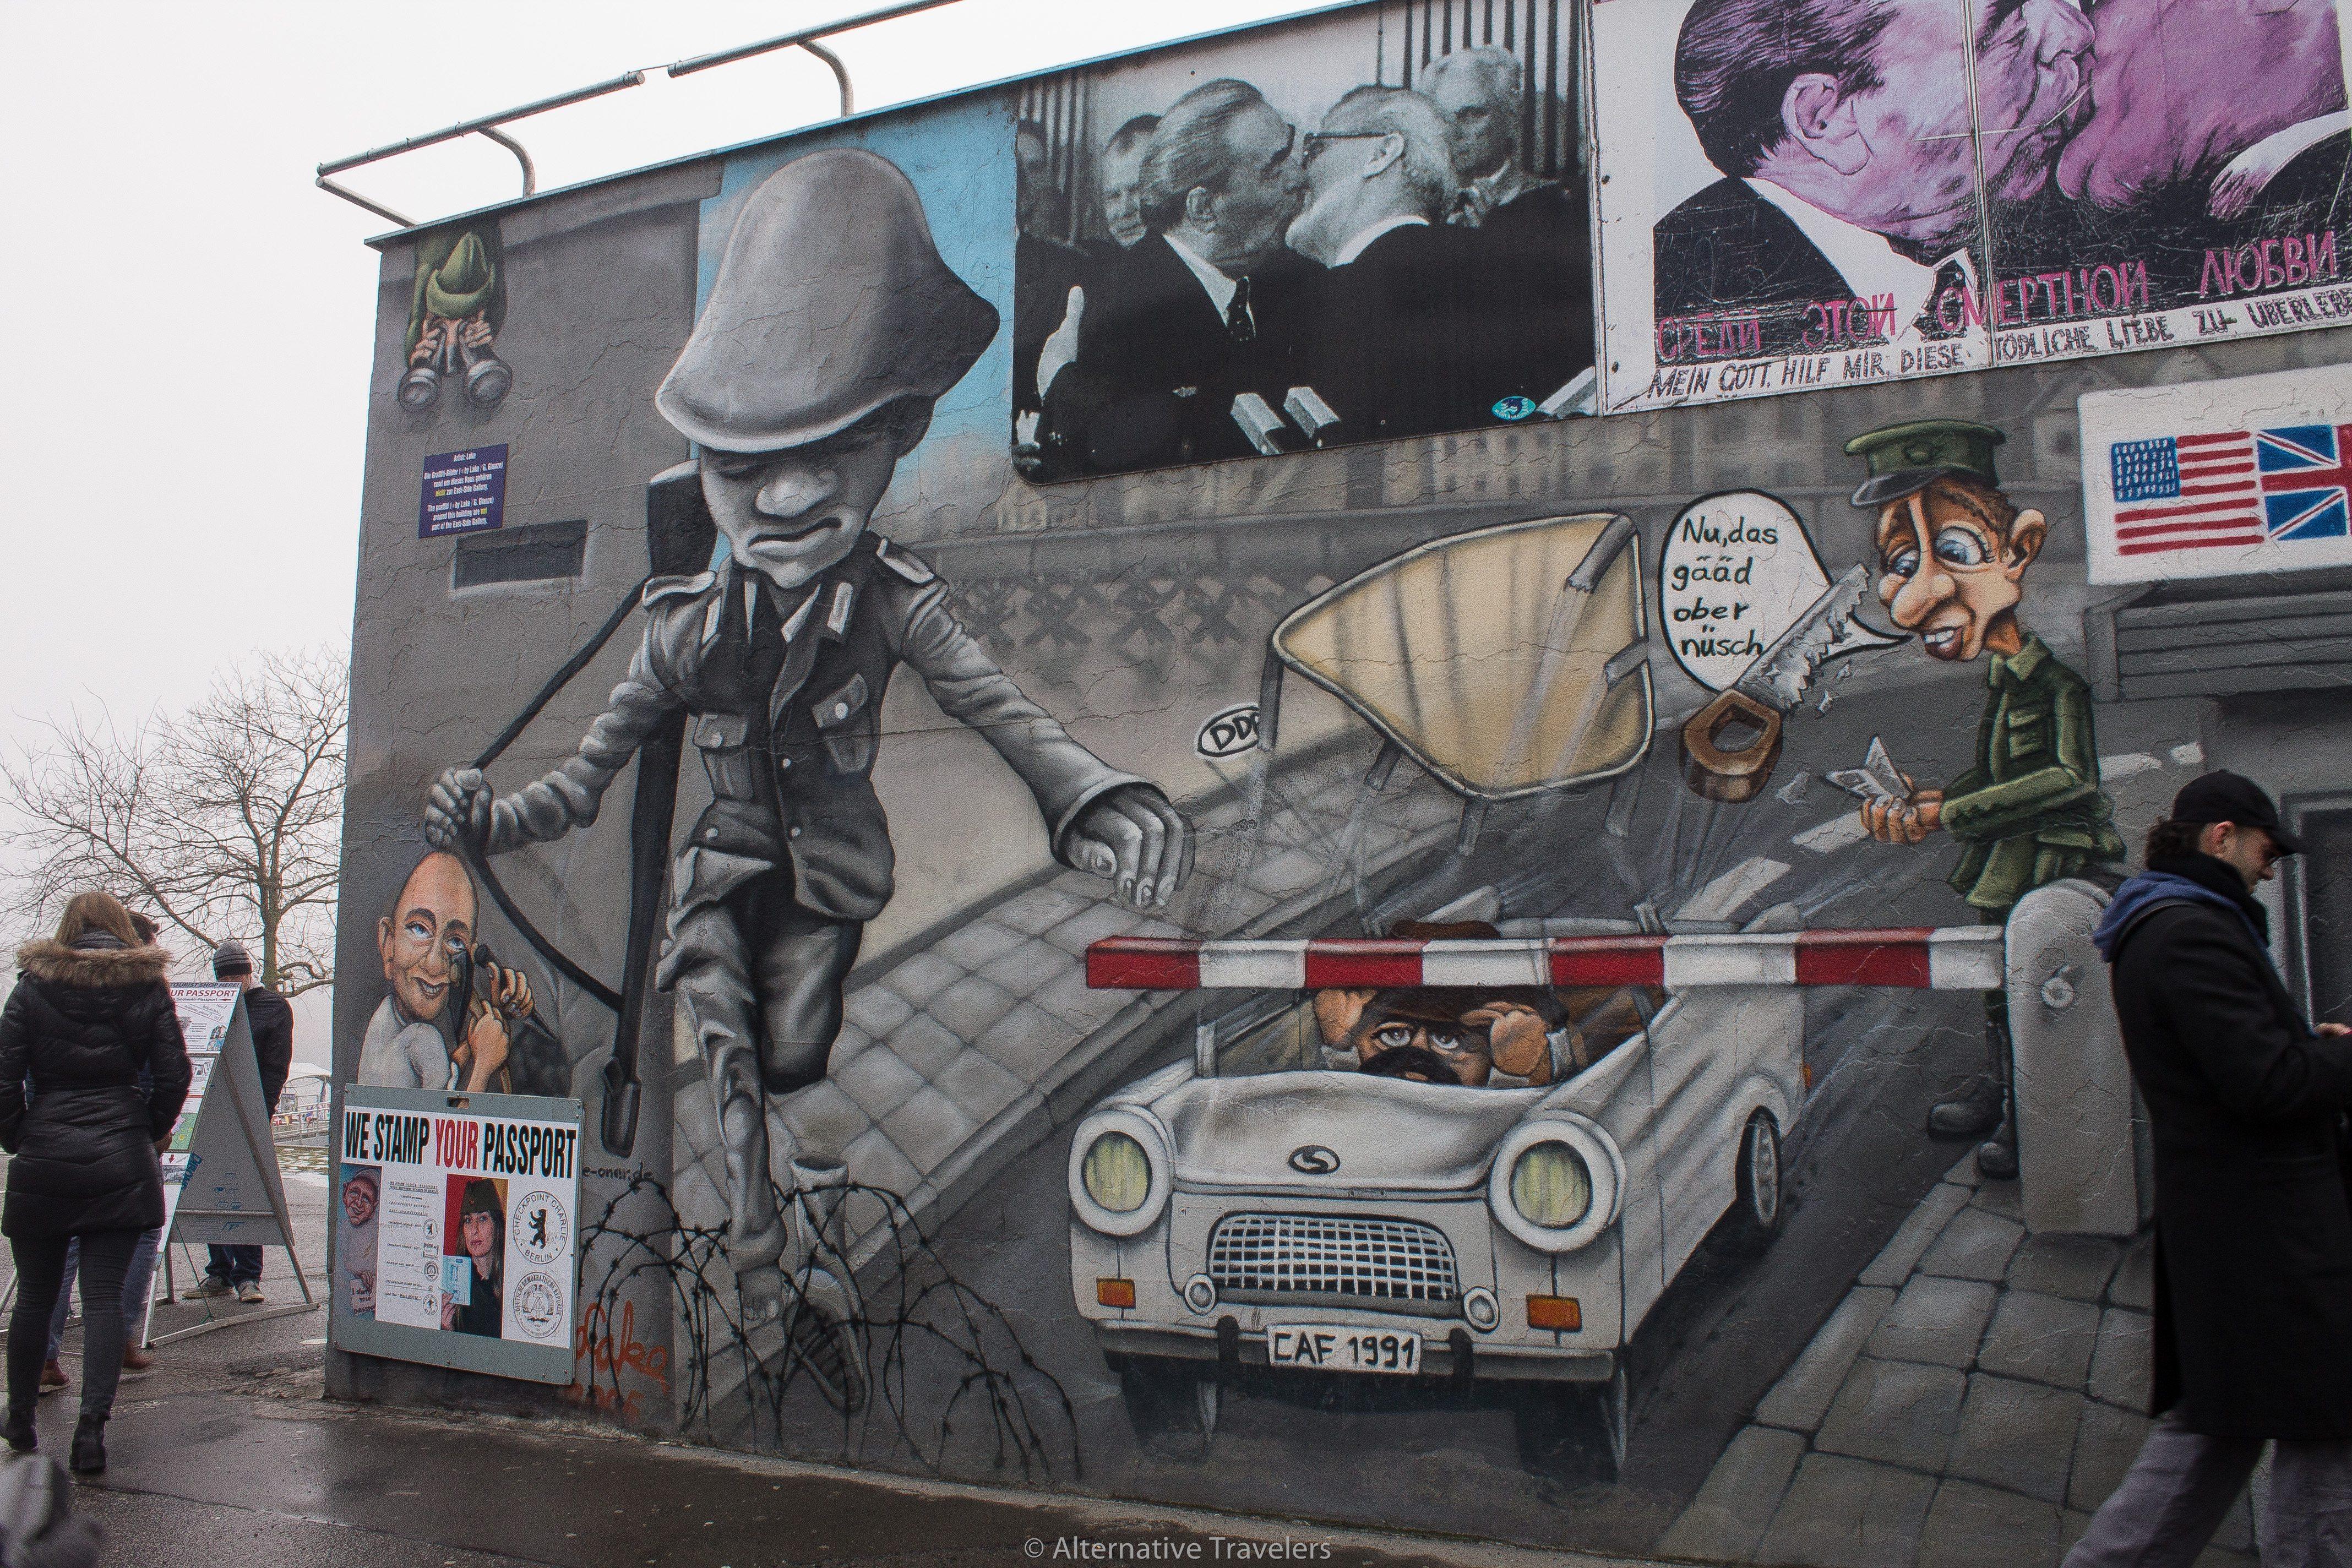 Checkpoint Charlie mural on the Berlin Wall | AlternativeTravelers.com